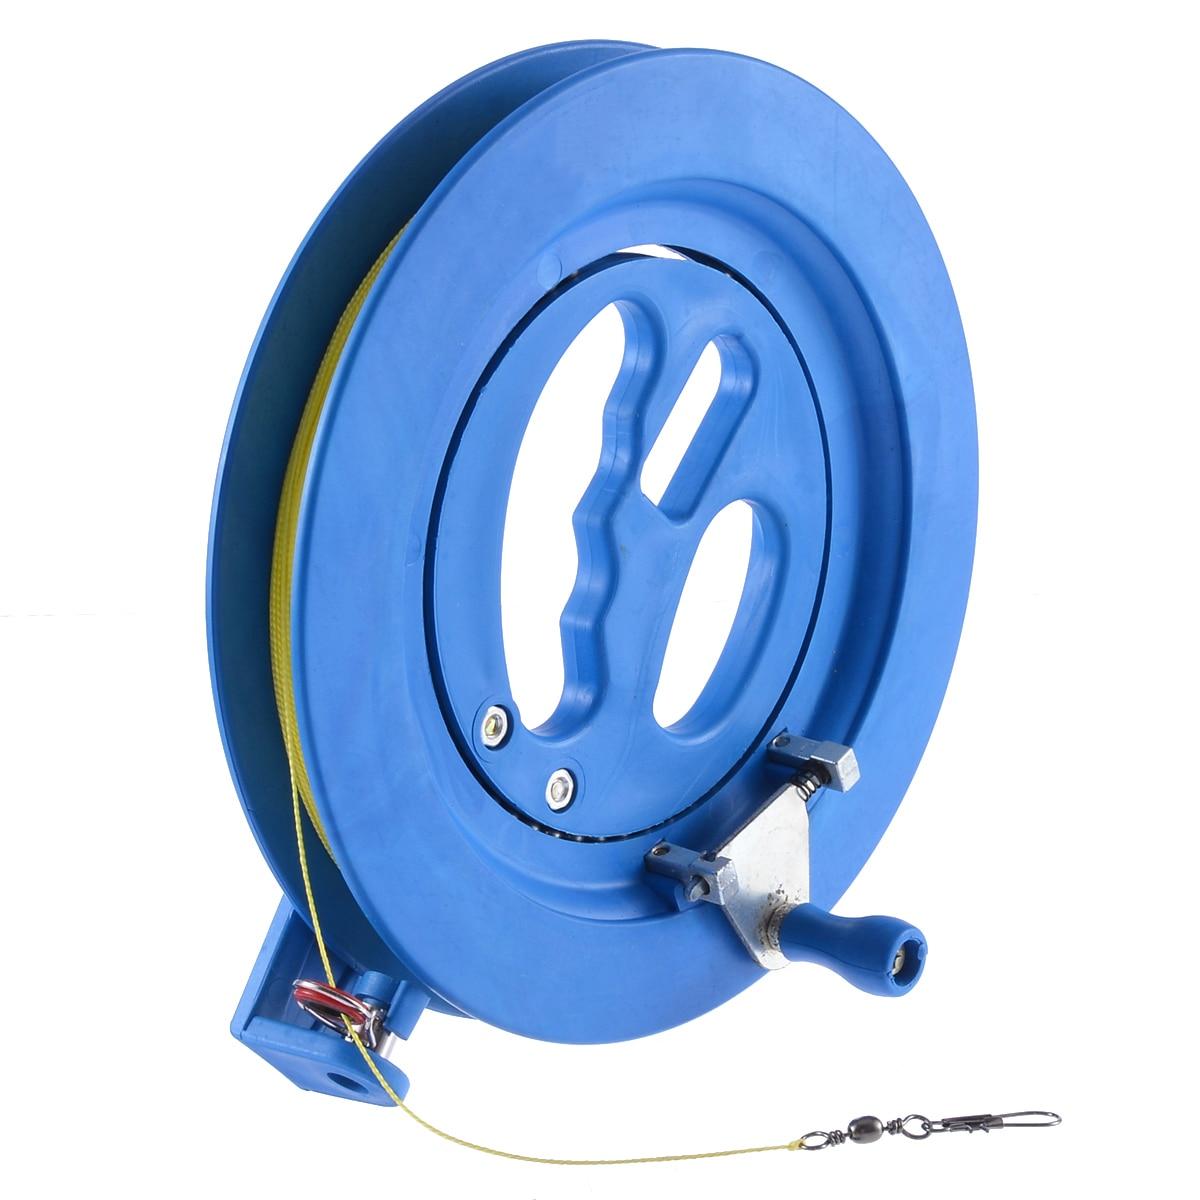 High Quality 200M Kite Line Winder Winding Reel Grip Wheel String Flying Tools Lock Kit